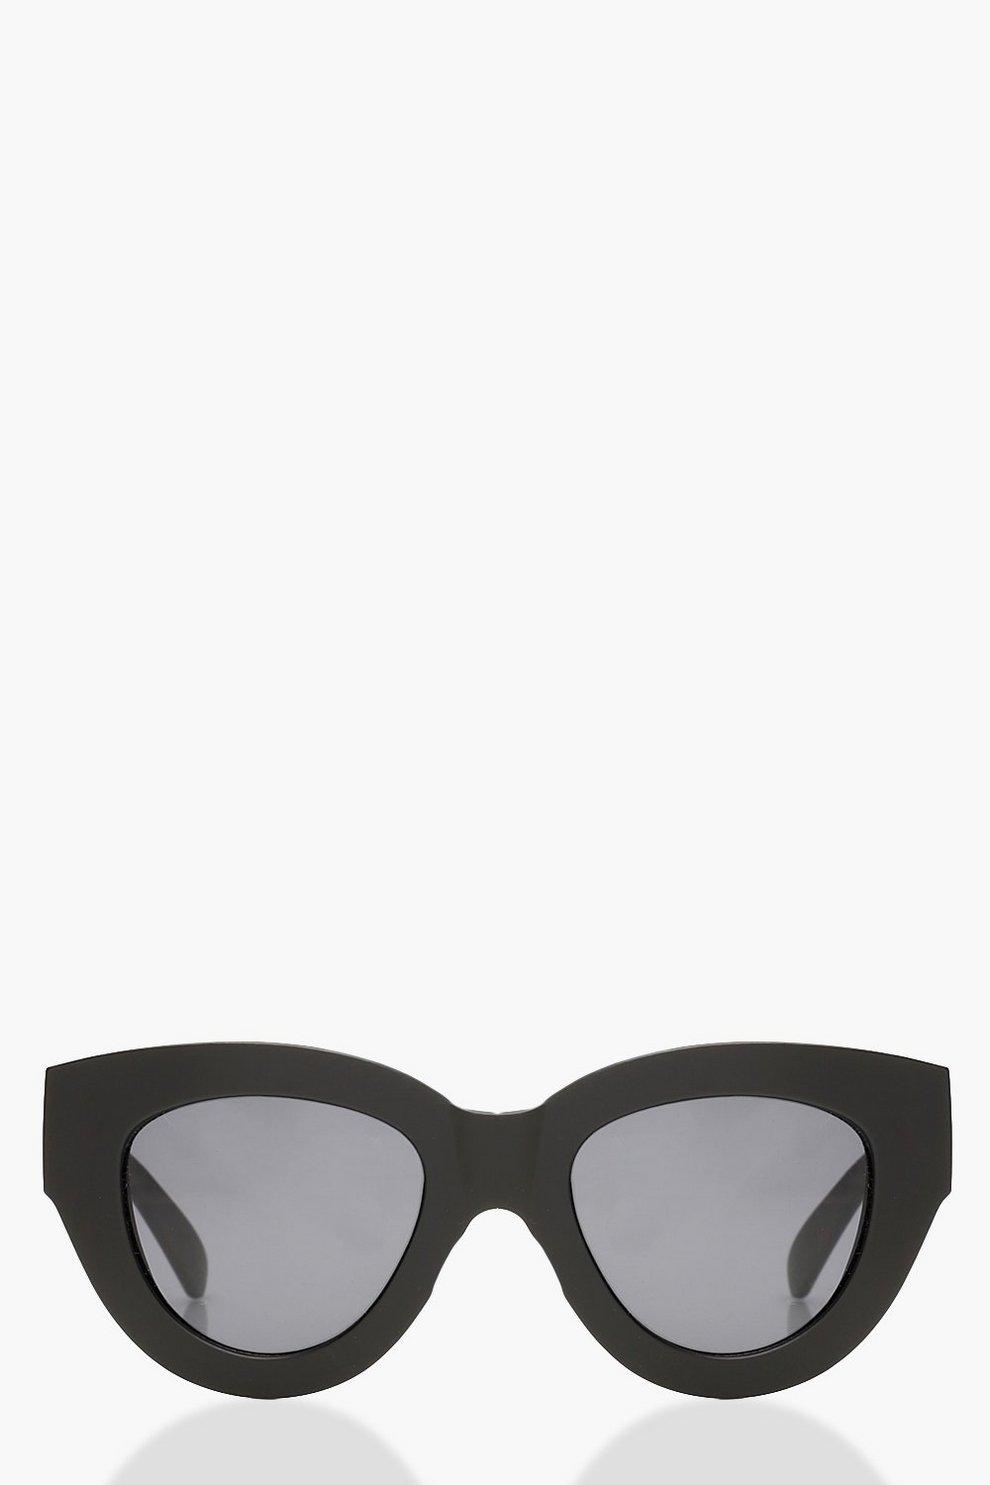 da808e64abd8 Skinny Rectangle Cat Eye Sunglasses | Boohoo